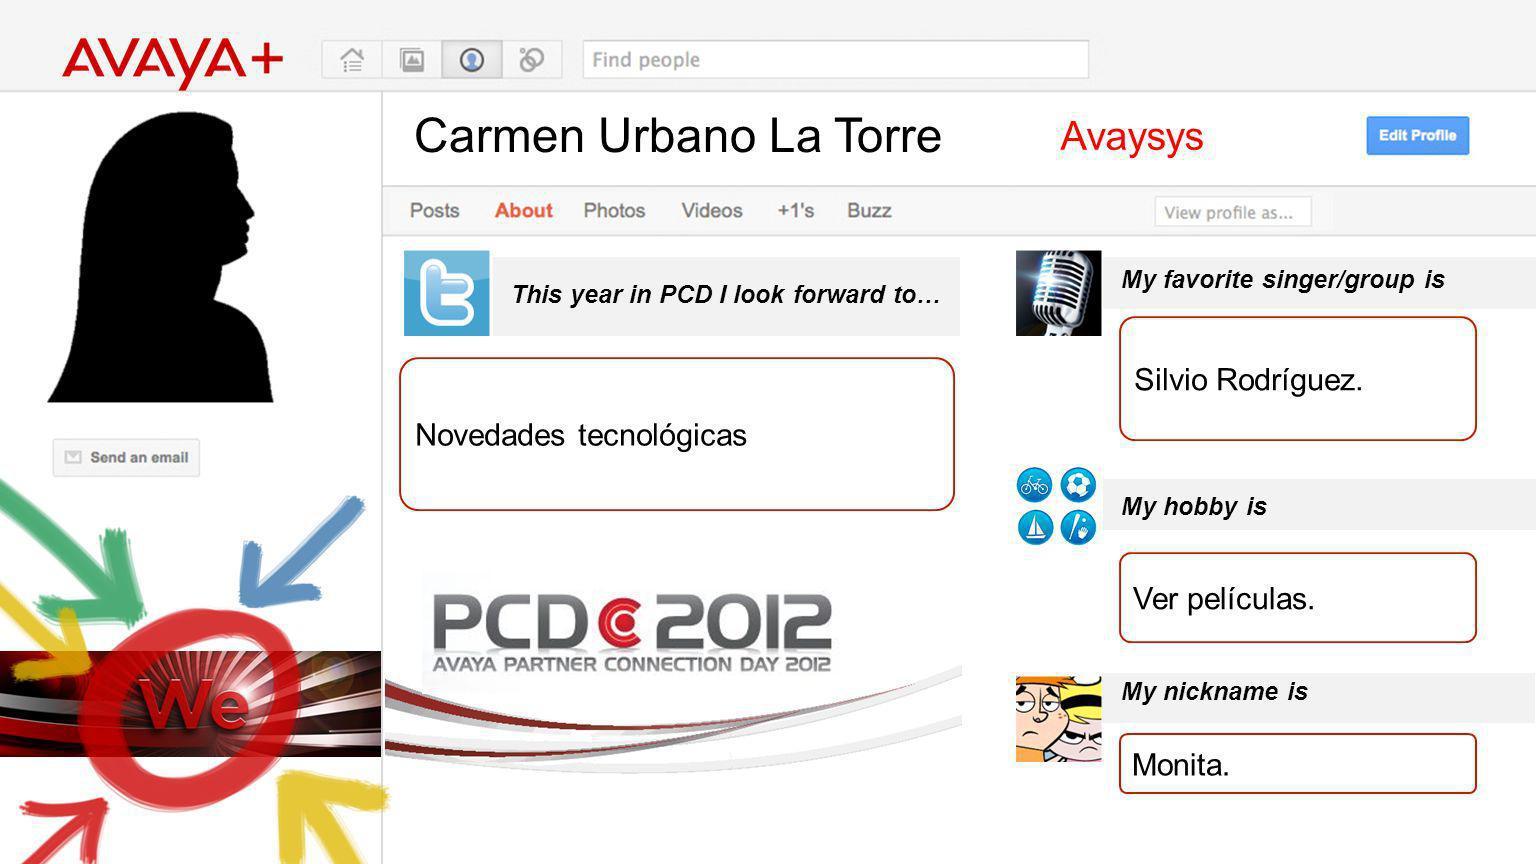 Carmen Urbano La Torre This year in PCD I look forward to… Avaysys Novedades tecnológicas My favorite singer/group is My hobby is My nickname is Silvi